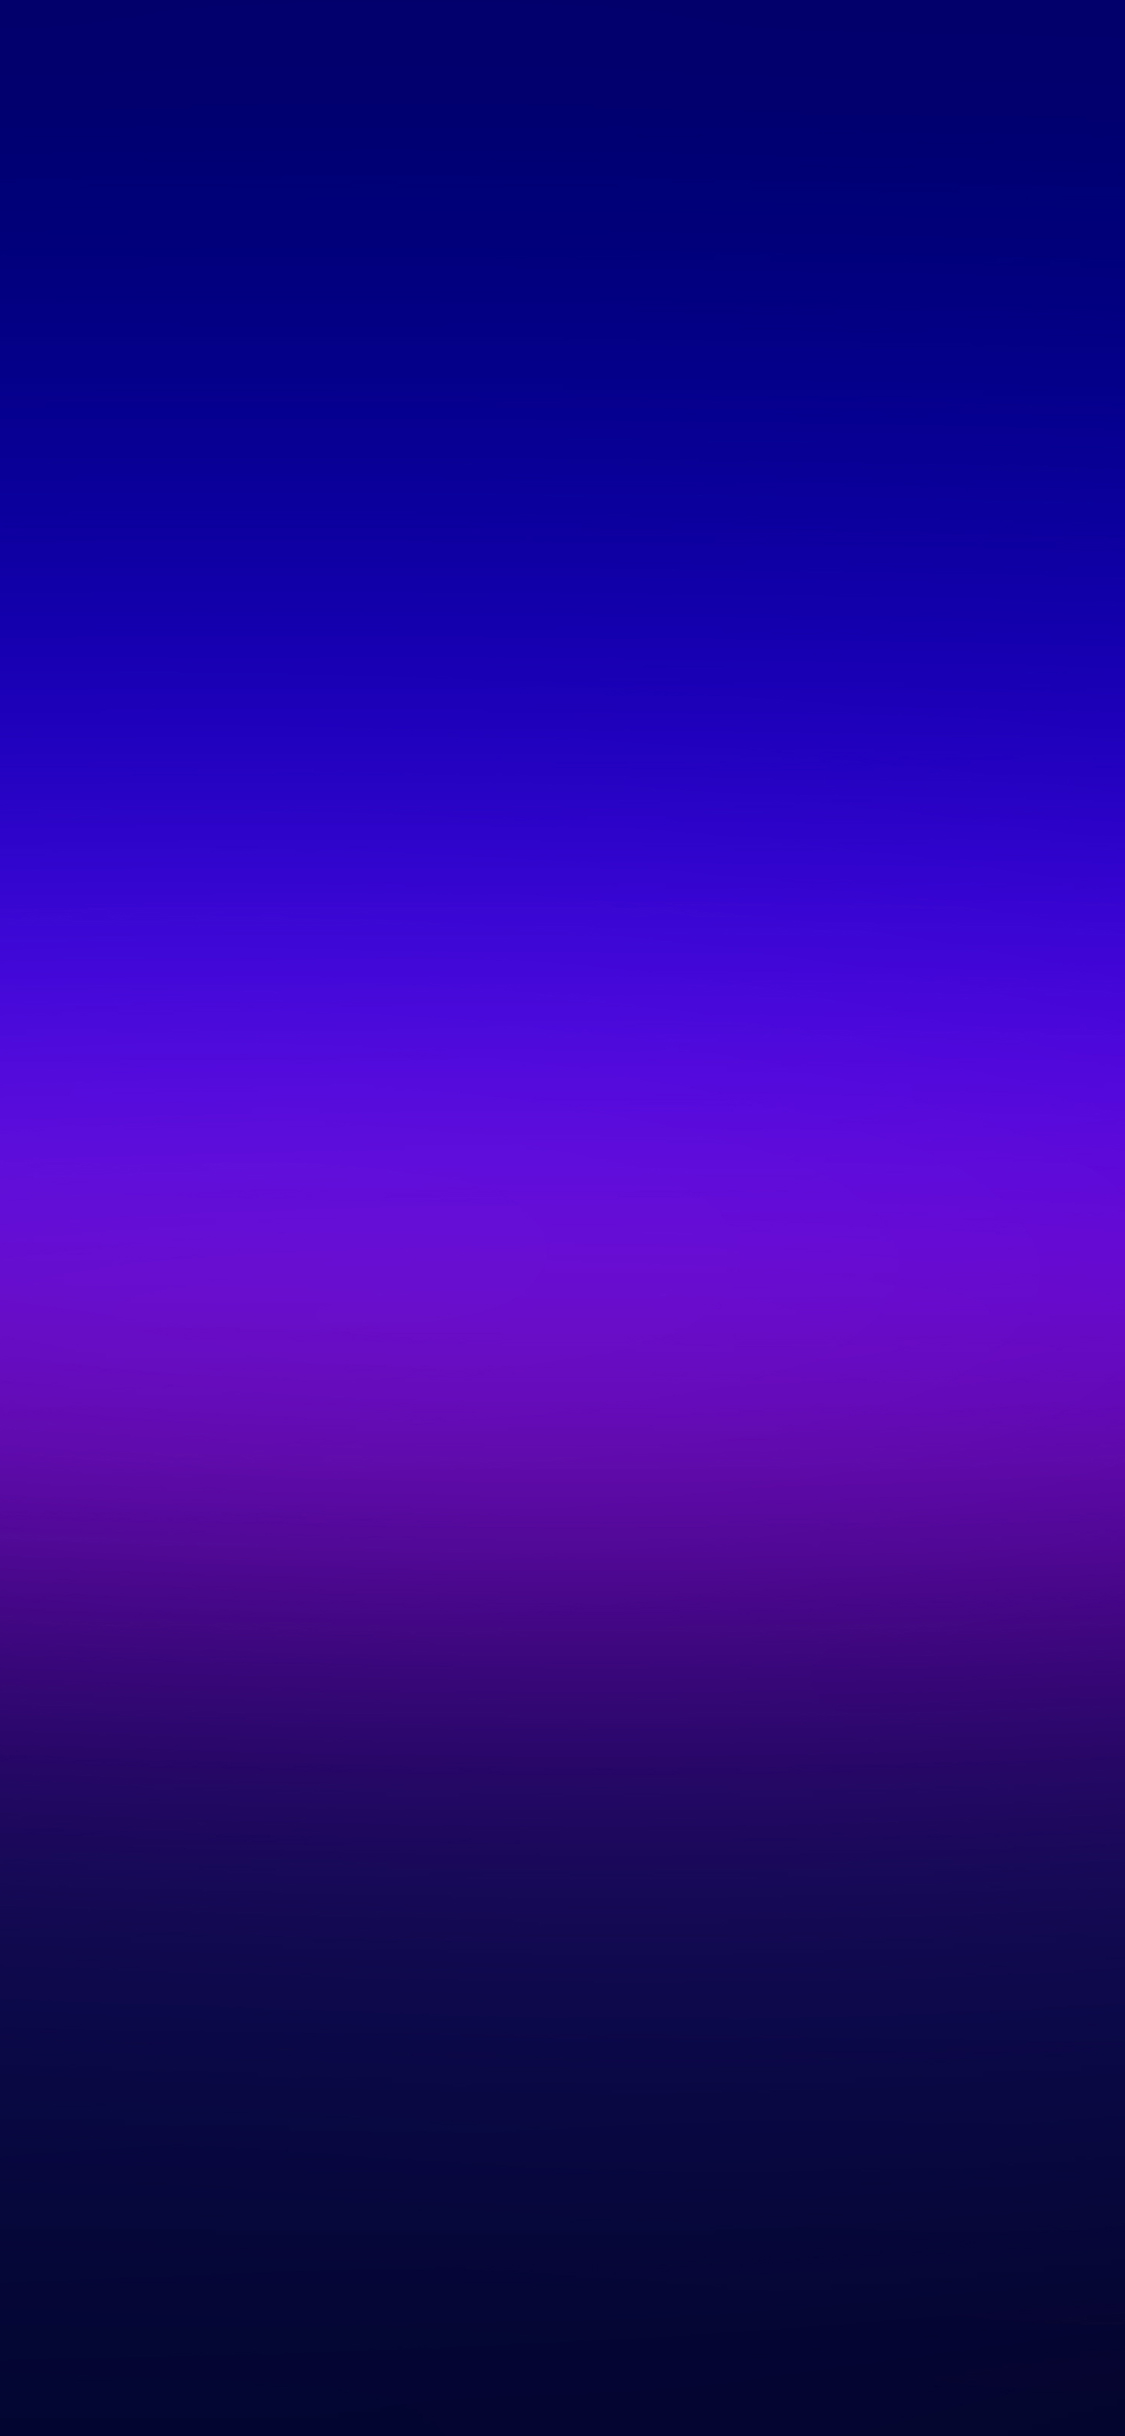 iPhoneXpapers.com-Apple-iPhone-wallpaper-sc21-bali-resort-romantic-night-blur